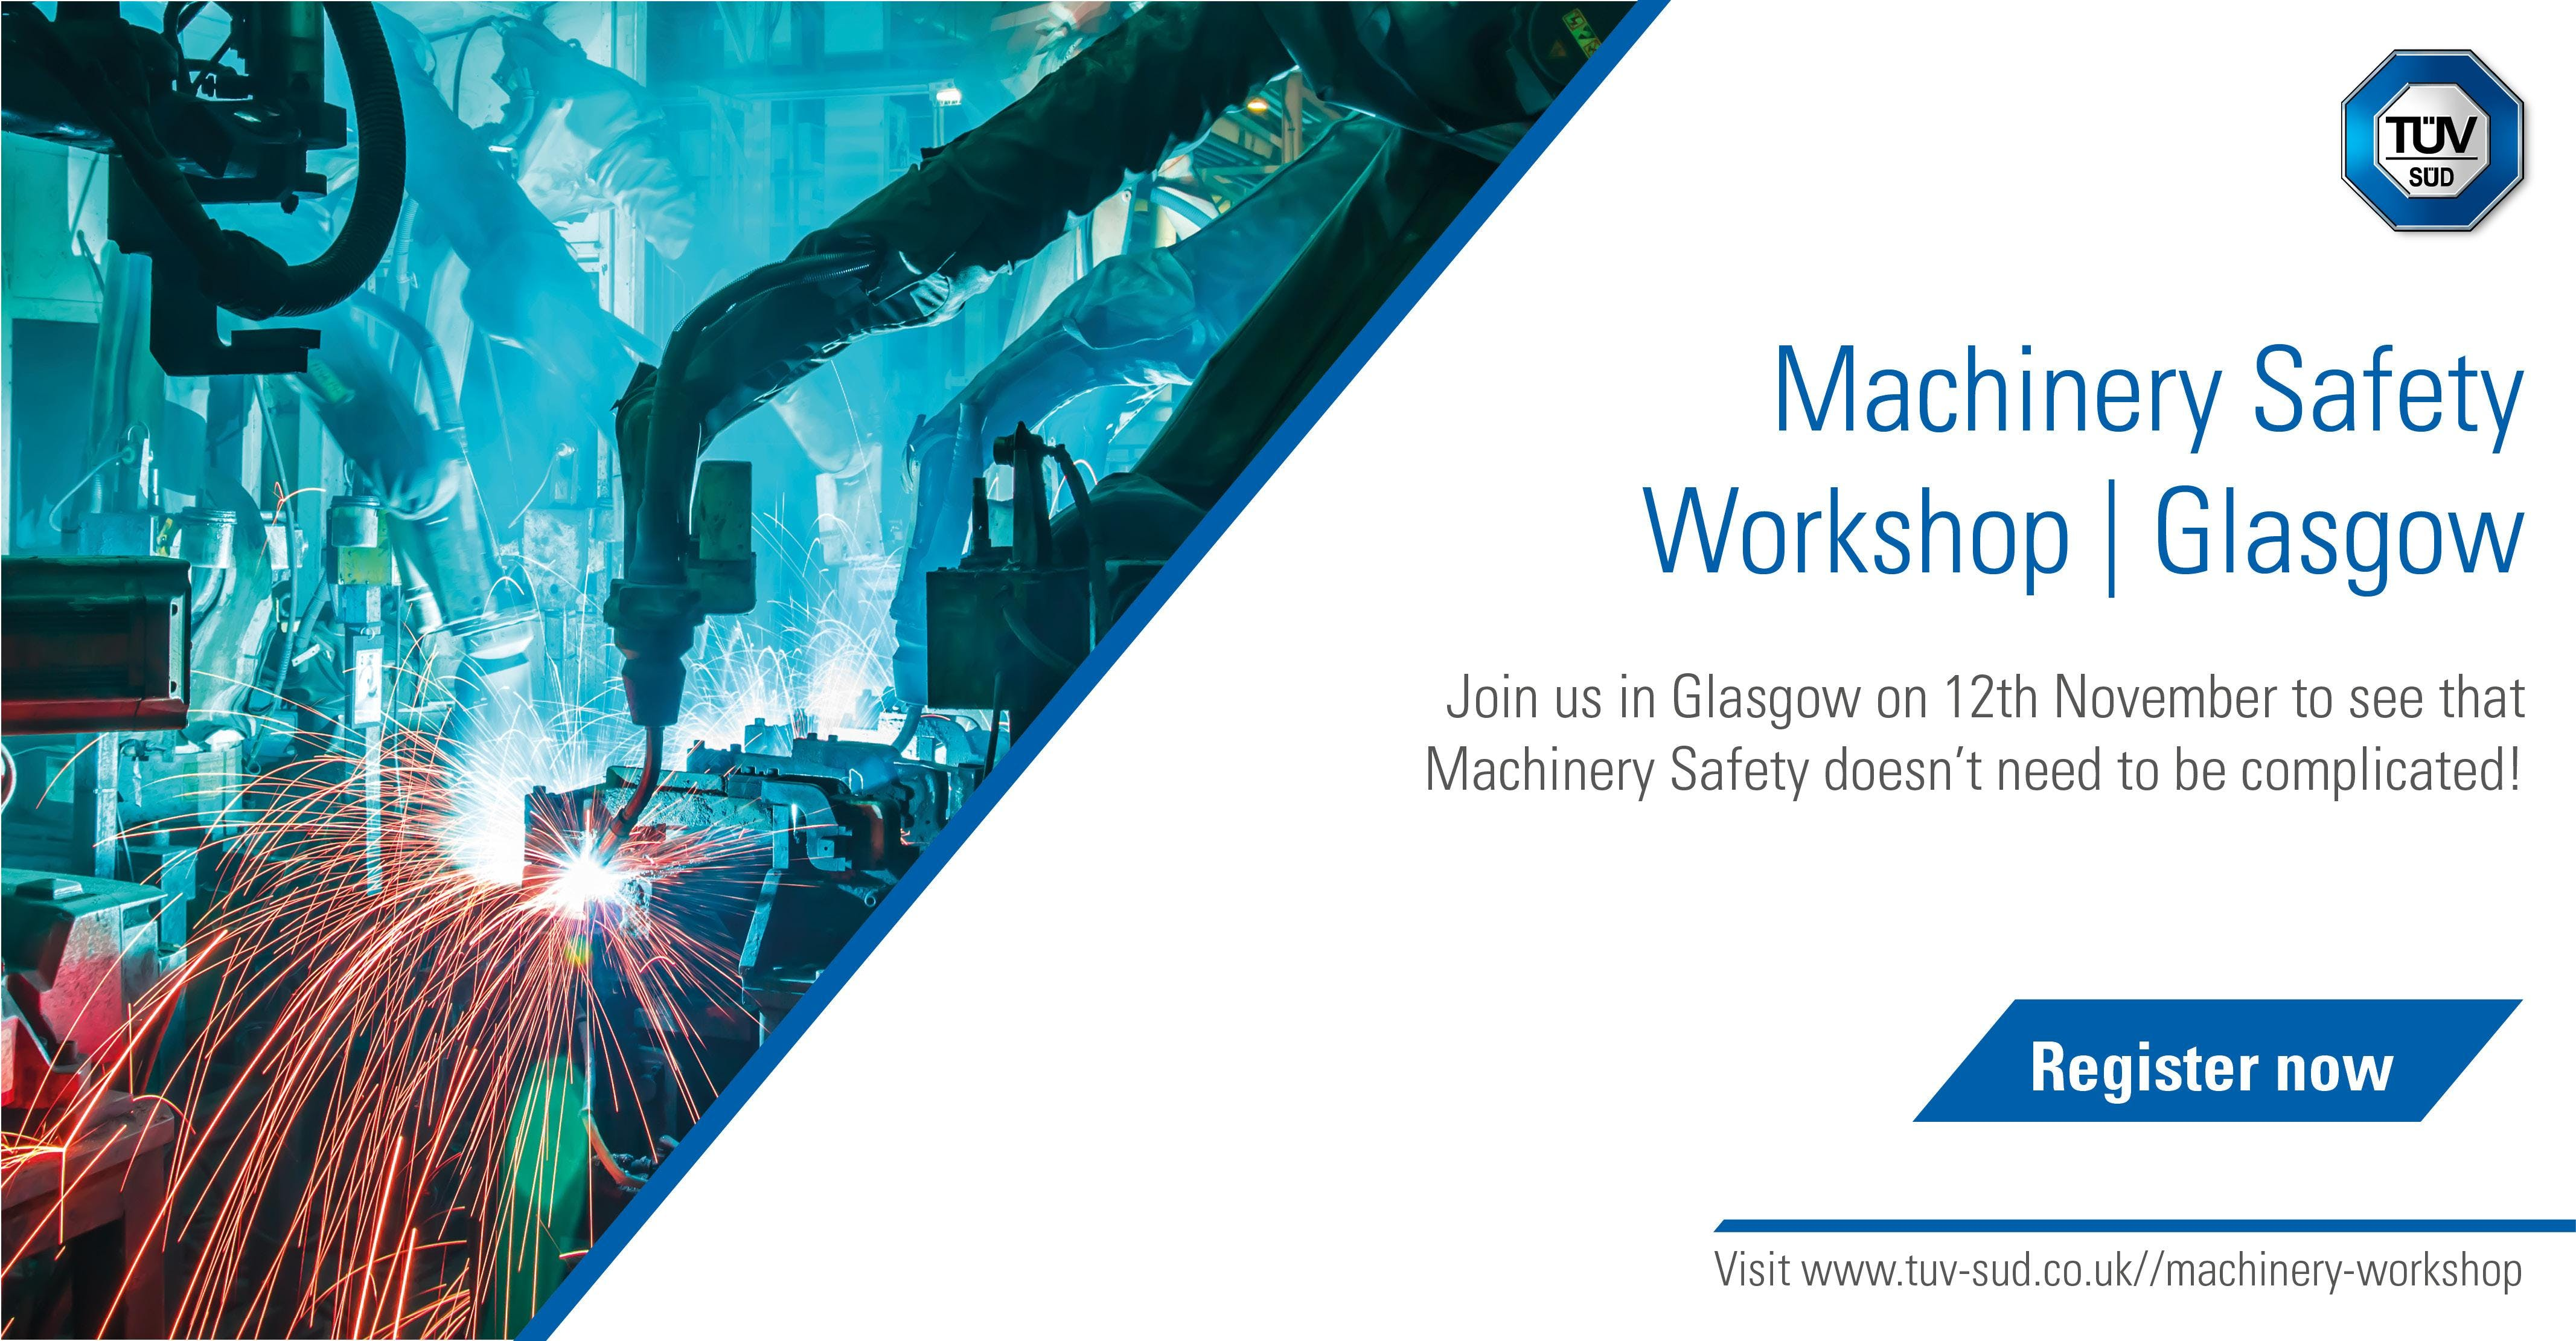 Machinery Safety Workshop | Glasgow